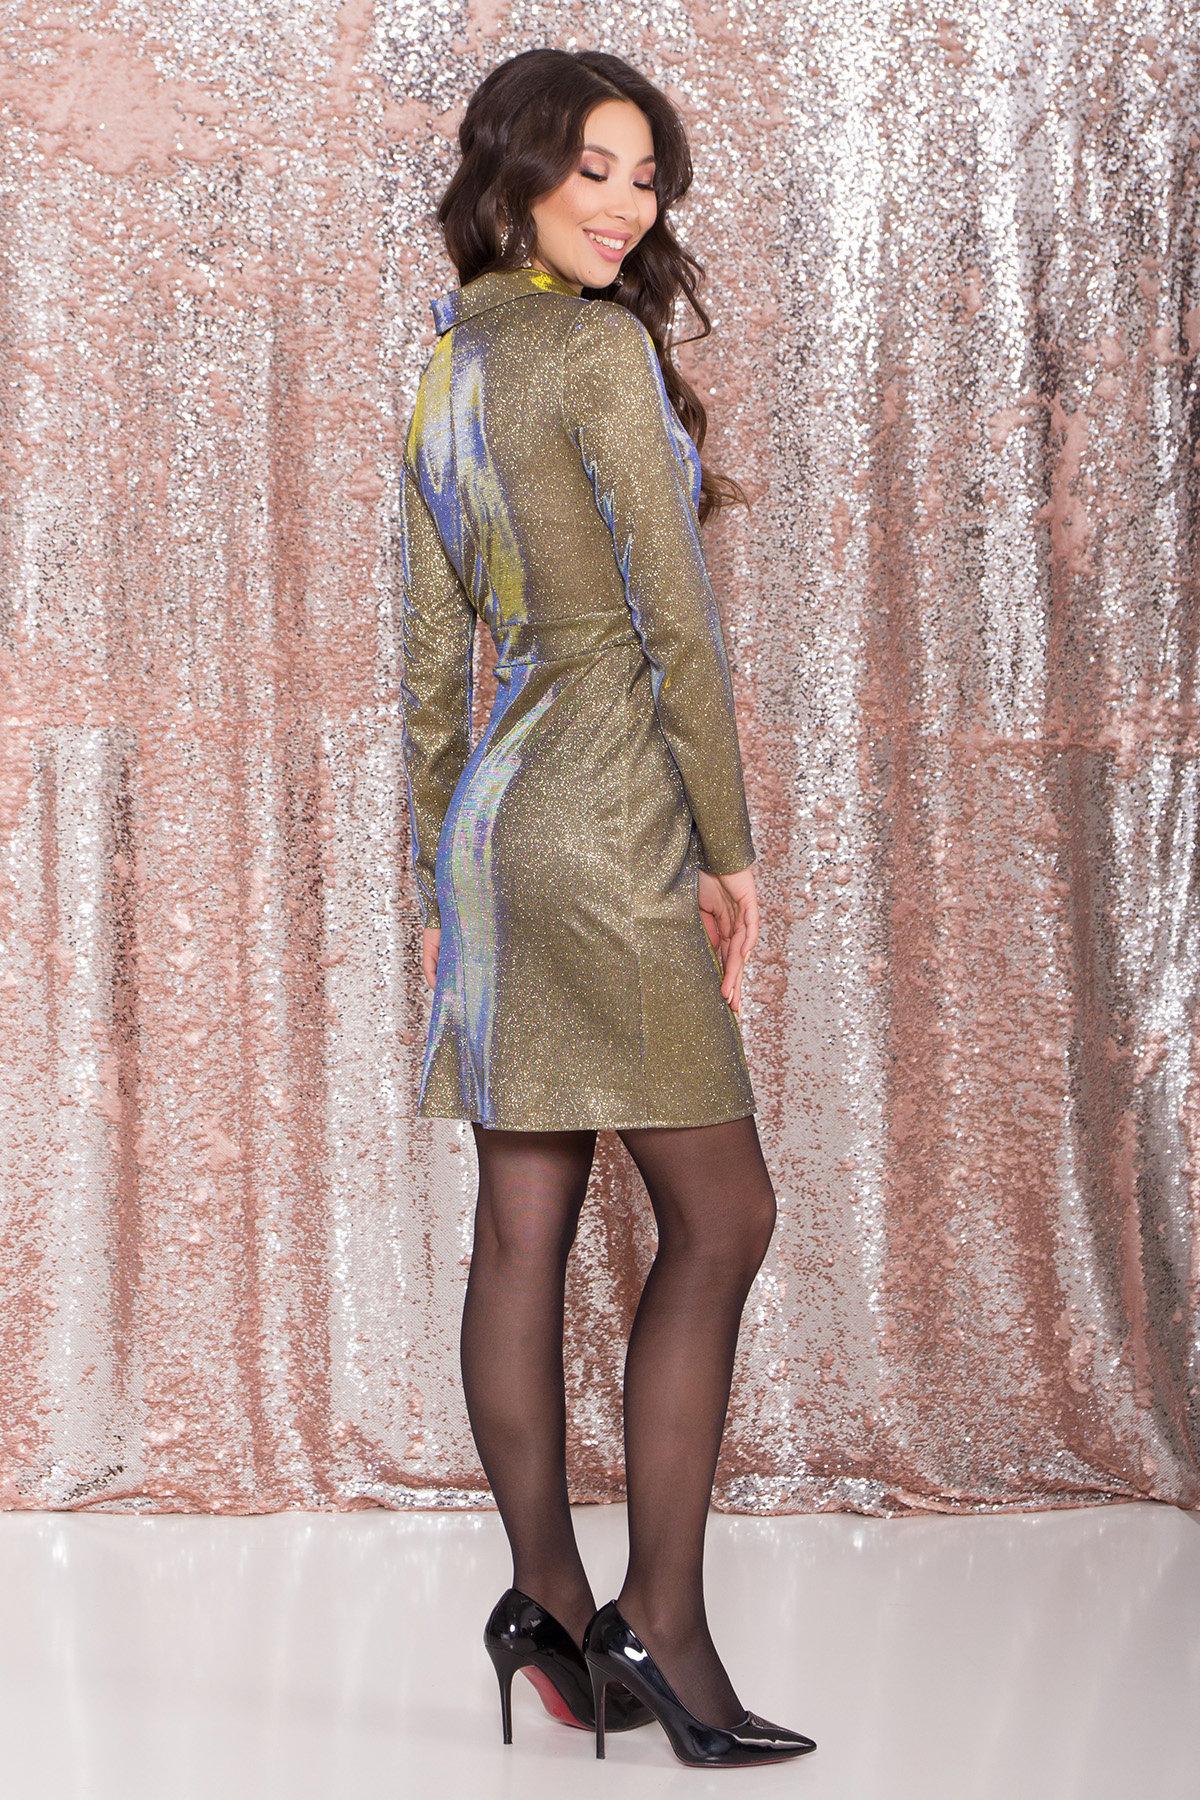 Платье Шати 8686 АРТ. 45015 Цвет: Золото/электрик - фото 6, интернет магазин tm-modus.ru